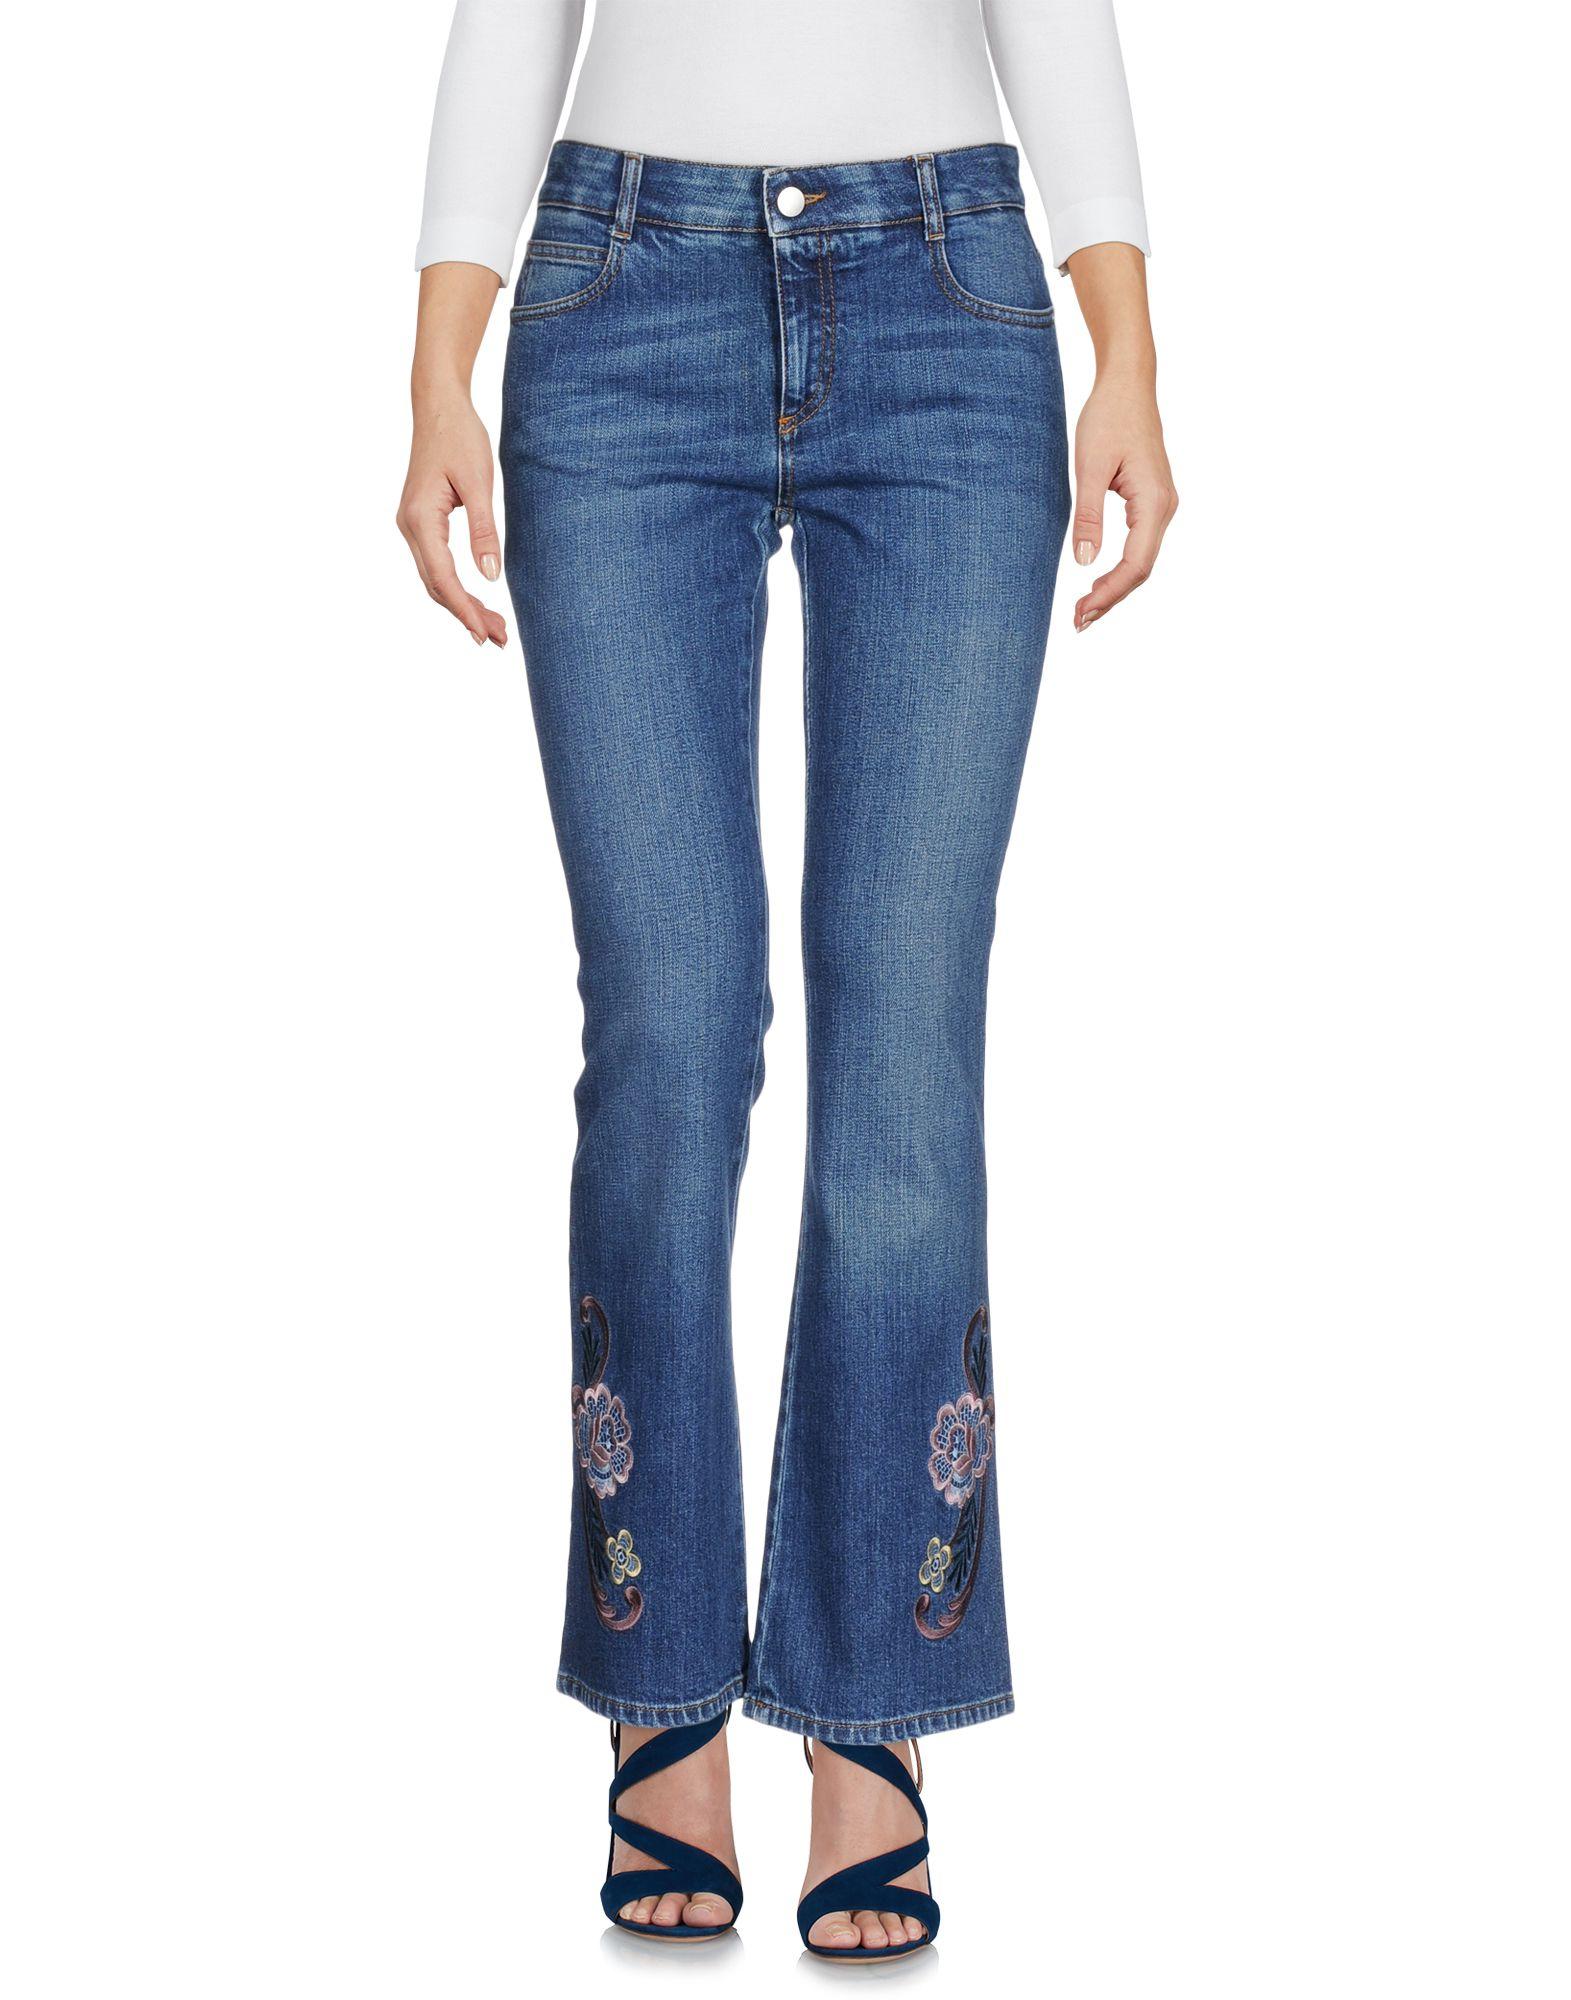 Pantaloni Jeans Stella Mccartney Donna - Acquista online su VPclG